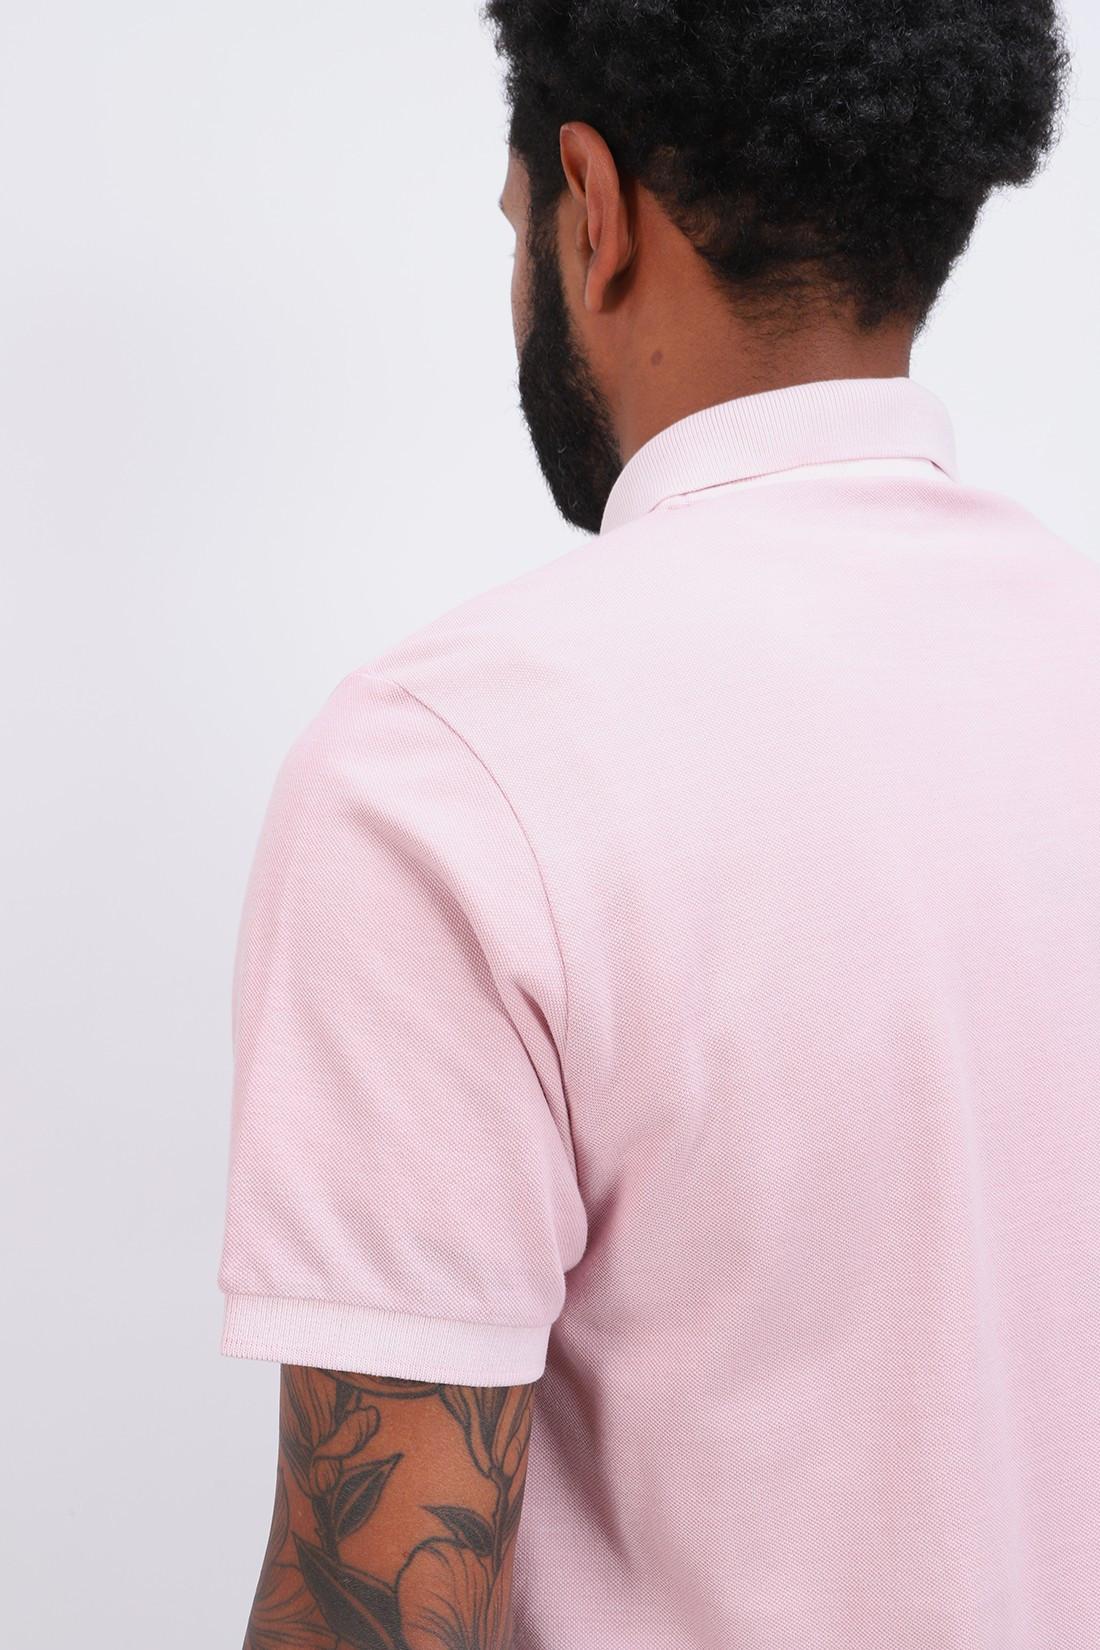 STONE ISLAND / 22s67 polo shirt v0082 Roza antico